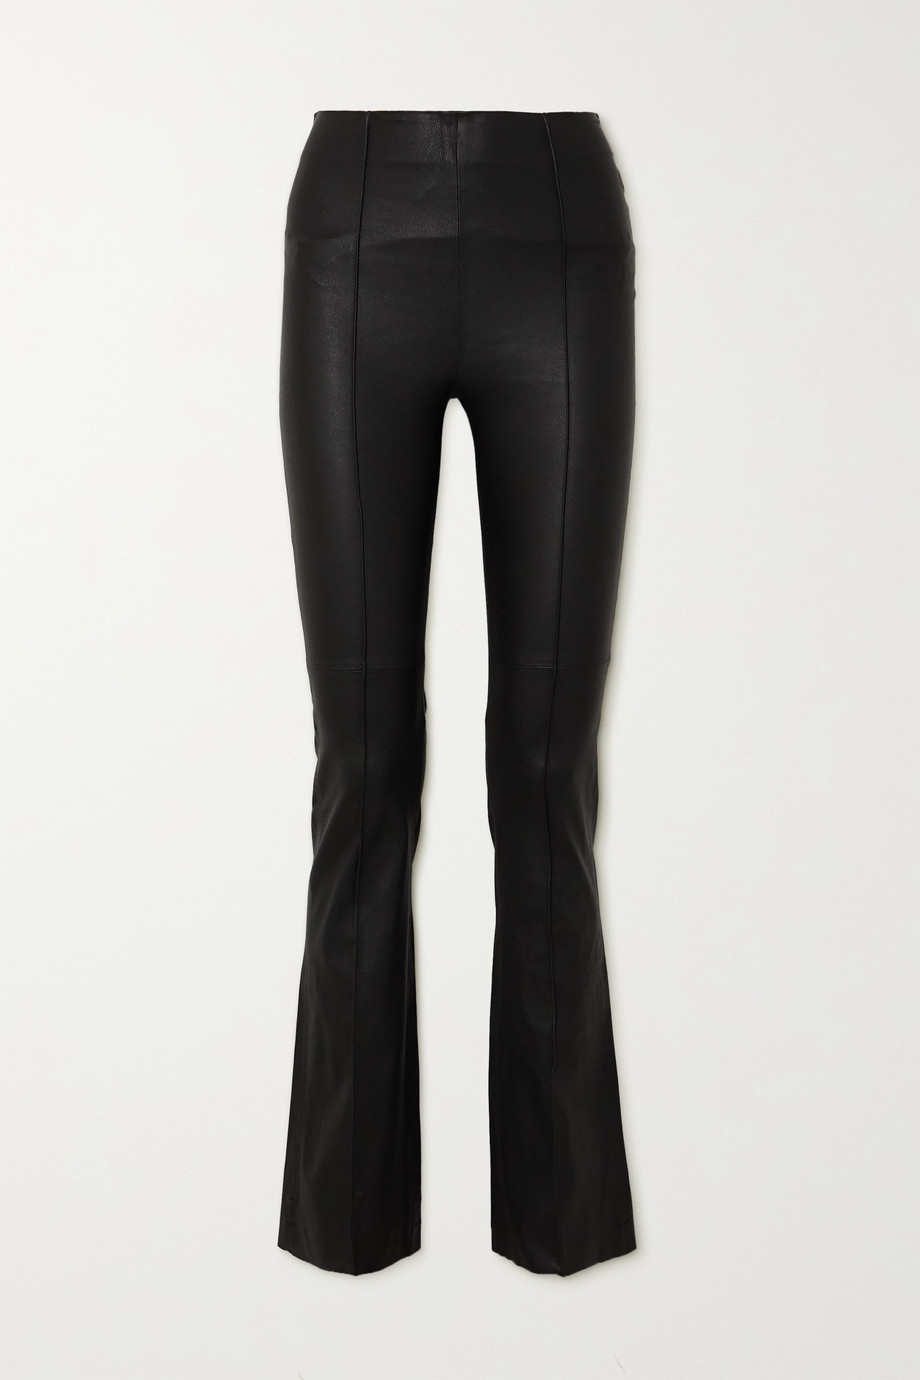 REMAIN Birger Christensen Floral leather flared pants